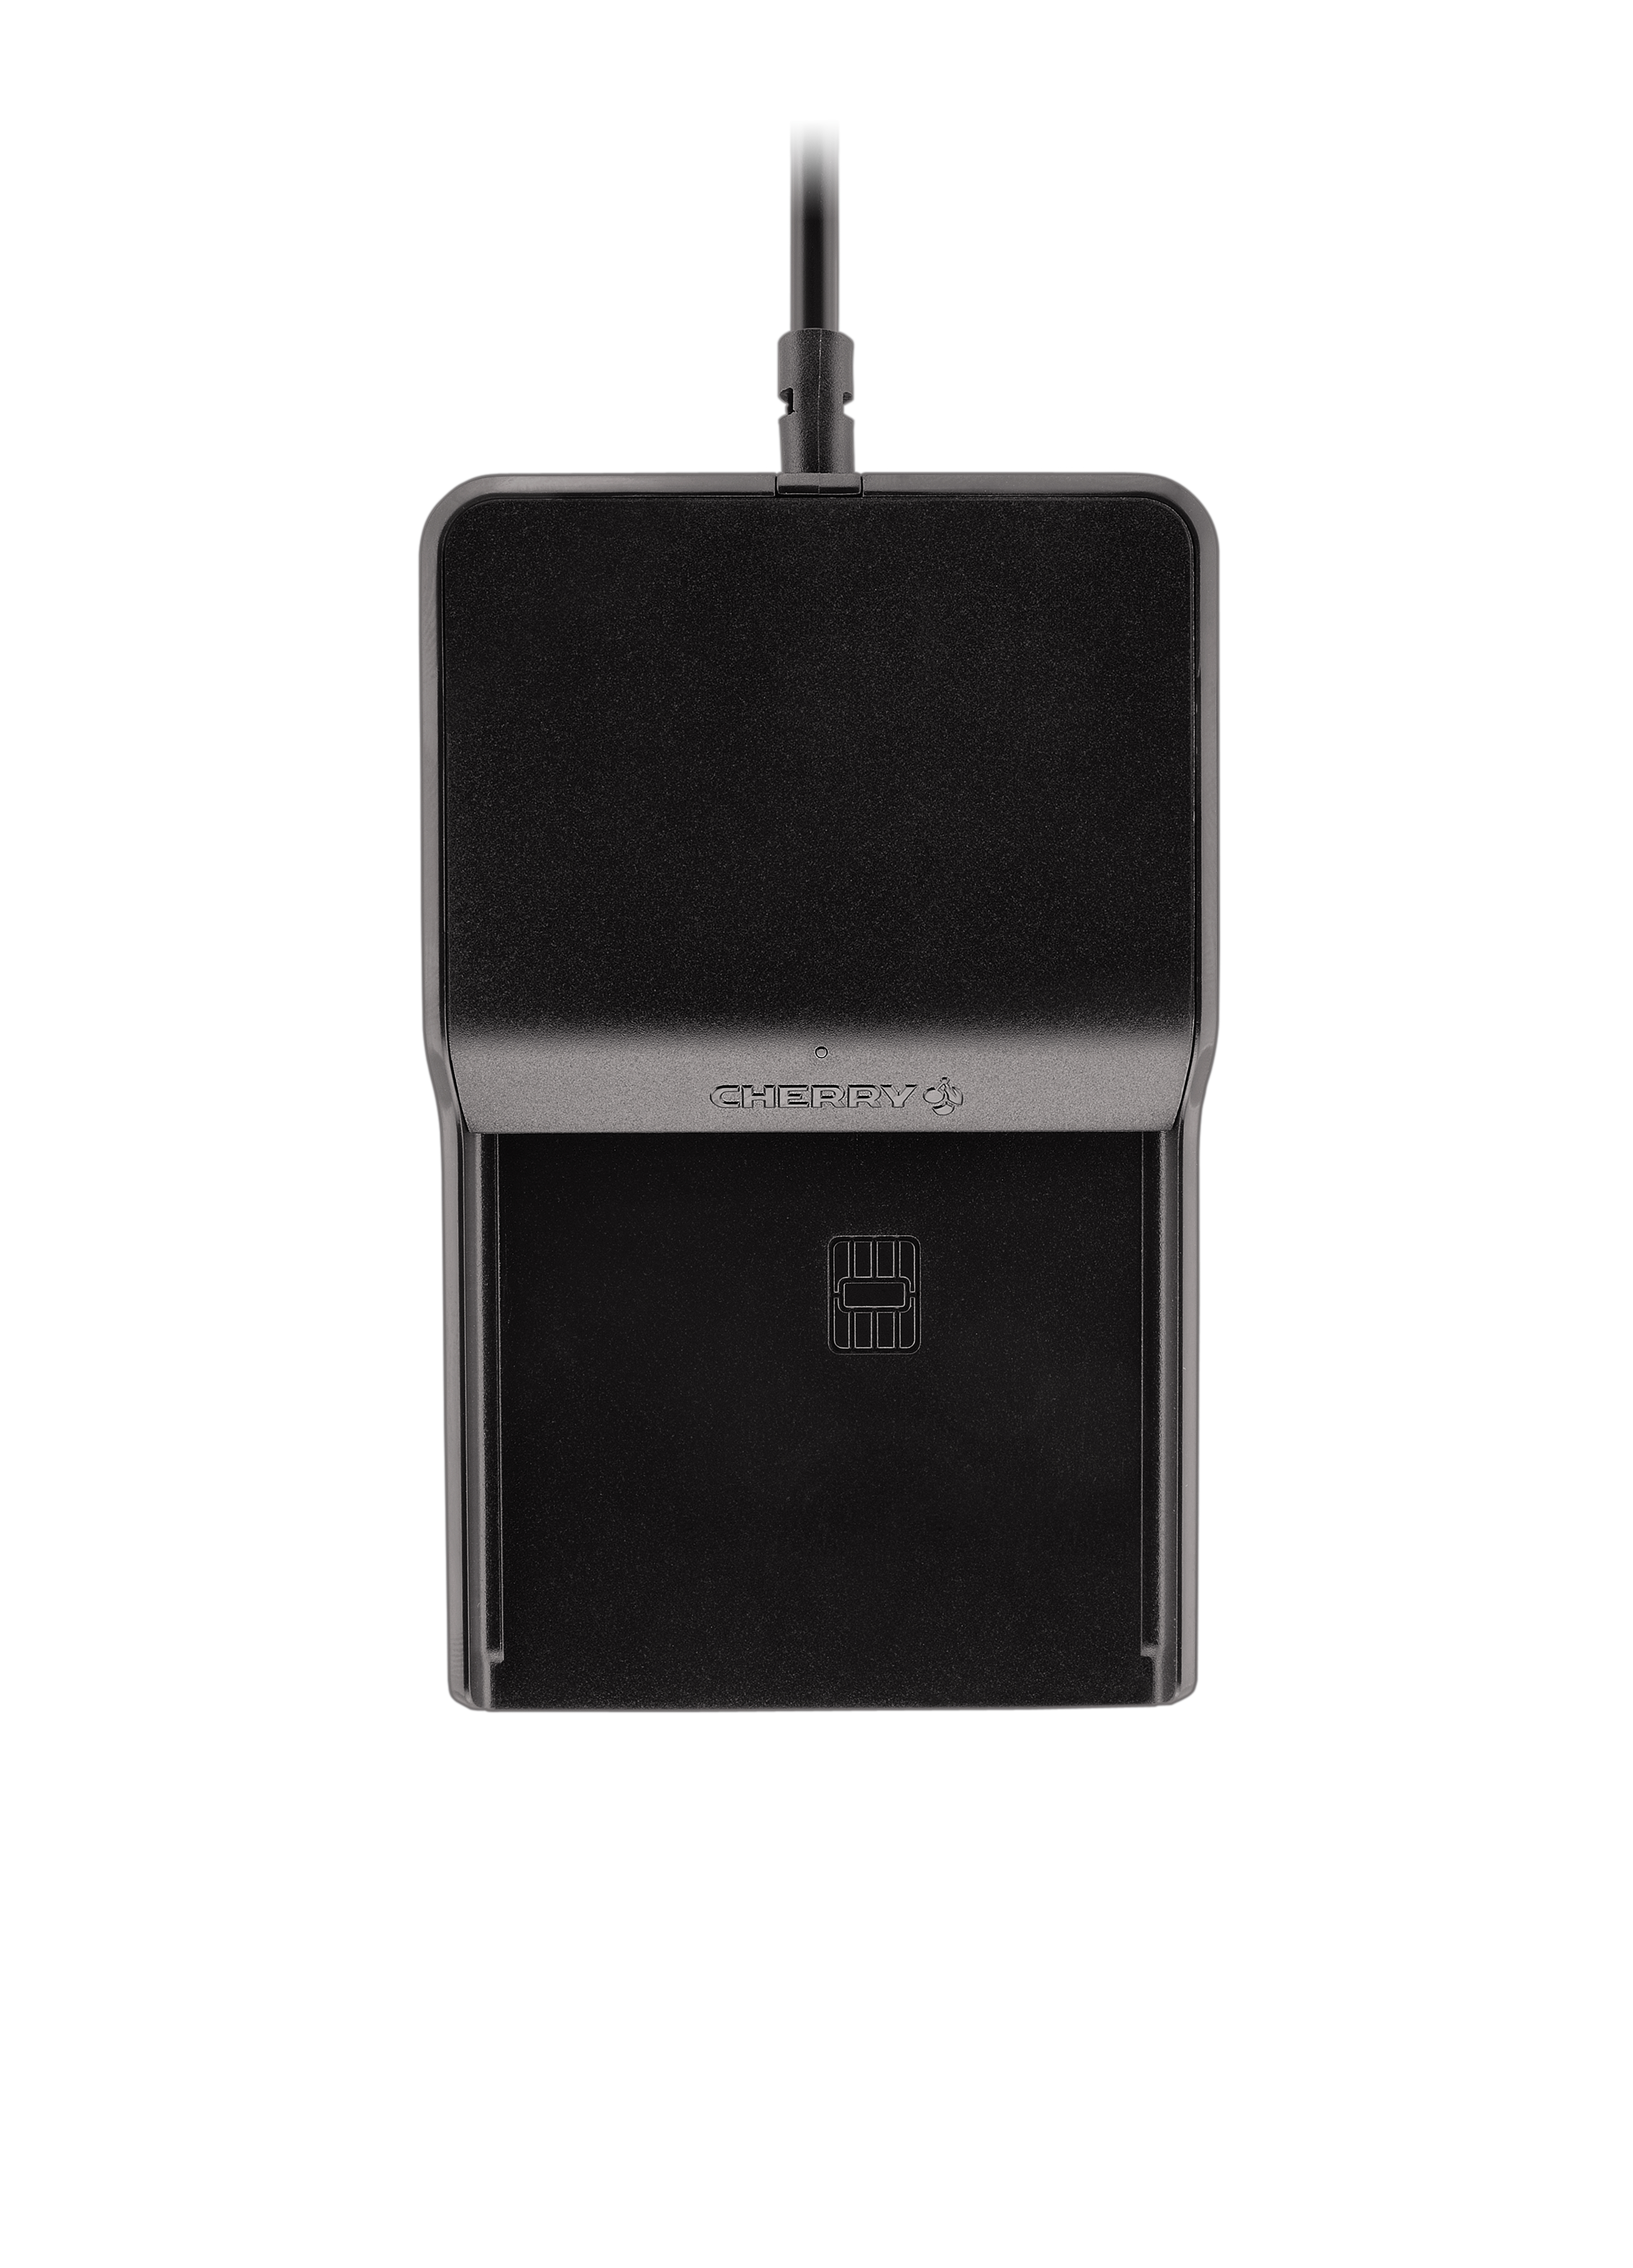 CHERRY SmartCardTerminal TC 1100 USB Klasse1 cardreader black